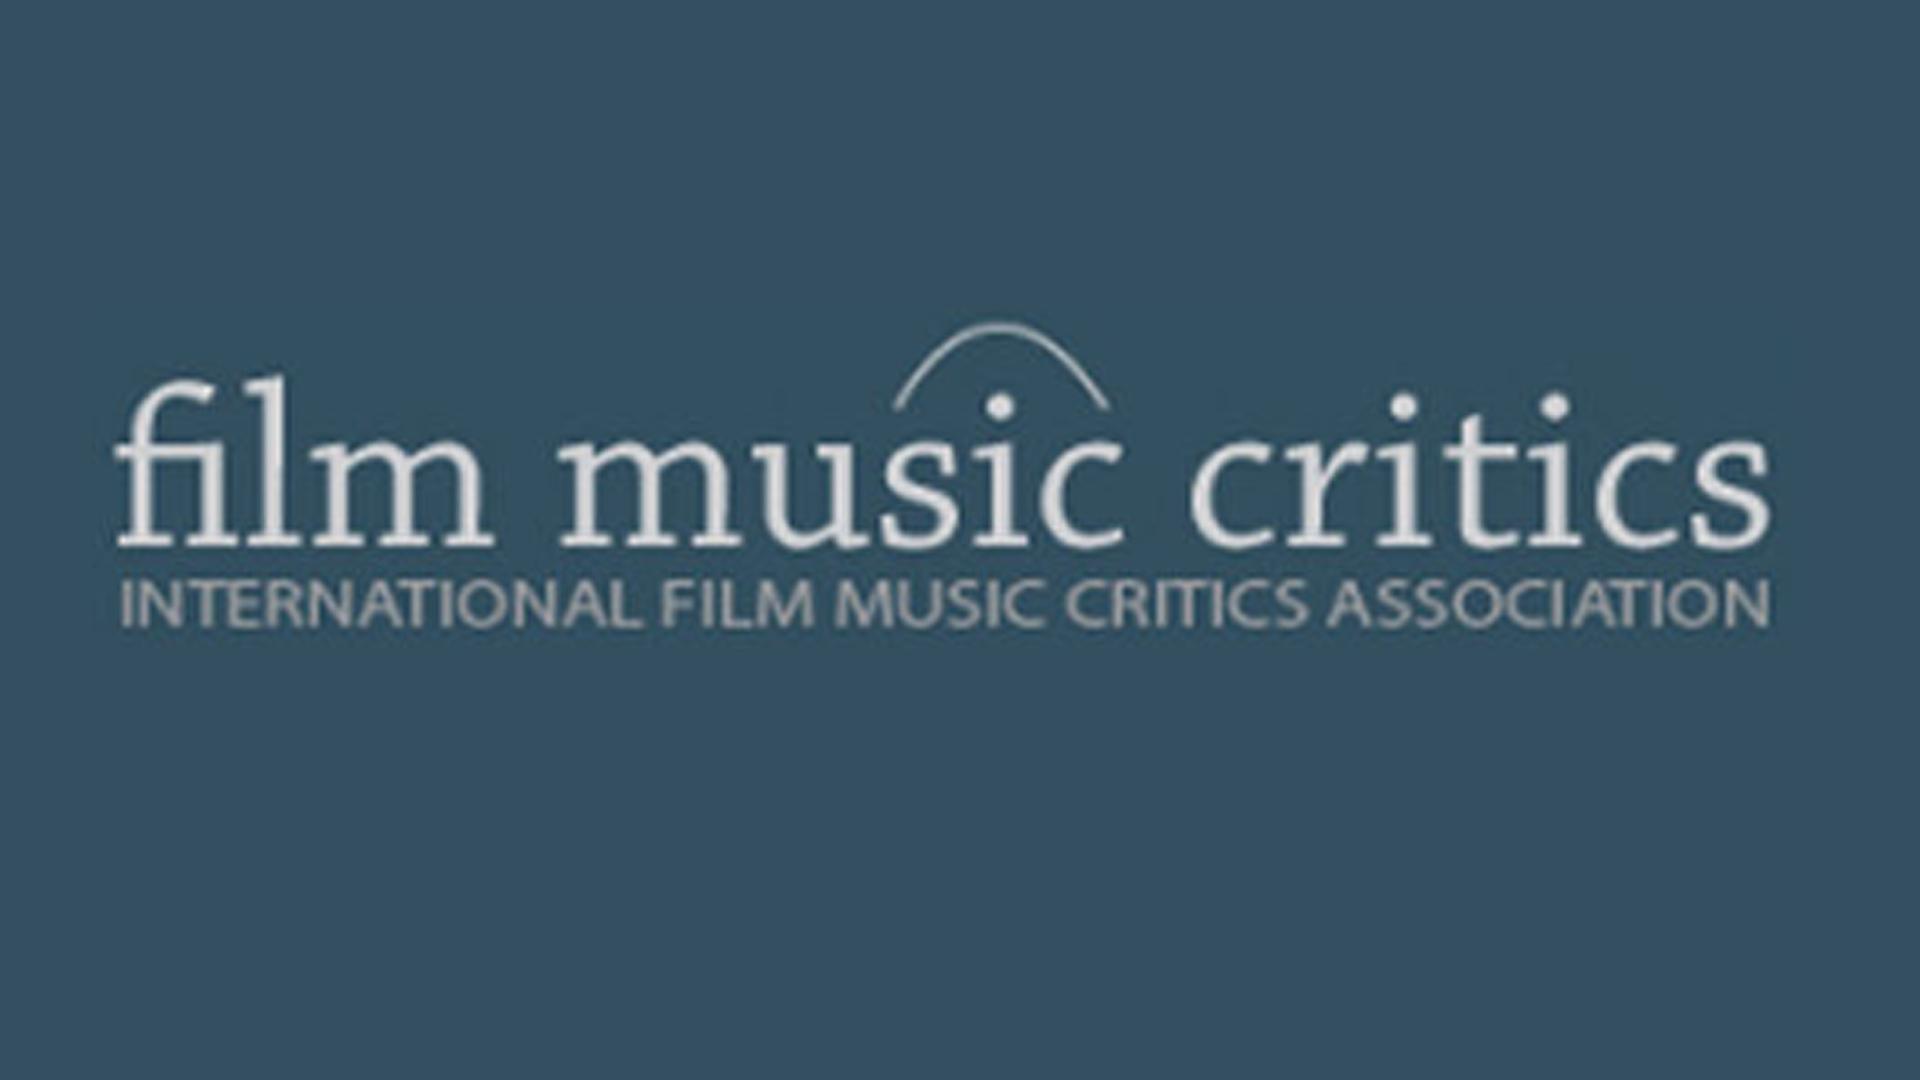 International Film Music Critics Association Awards